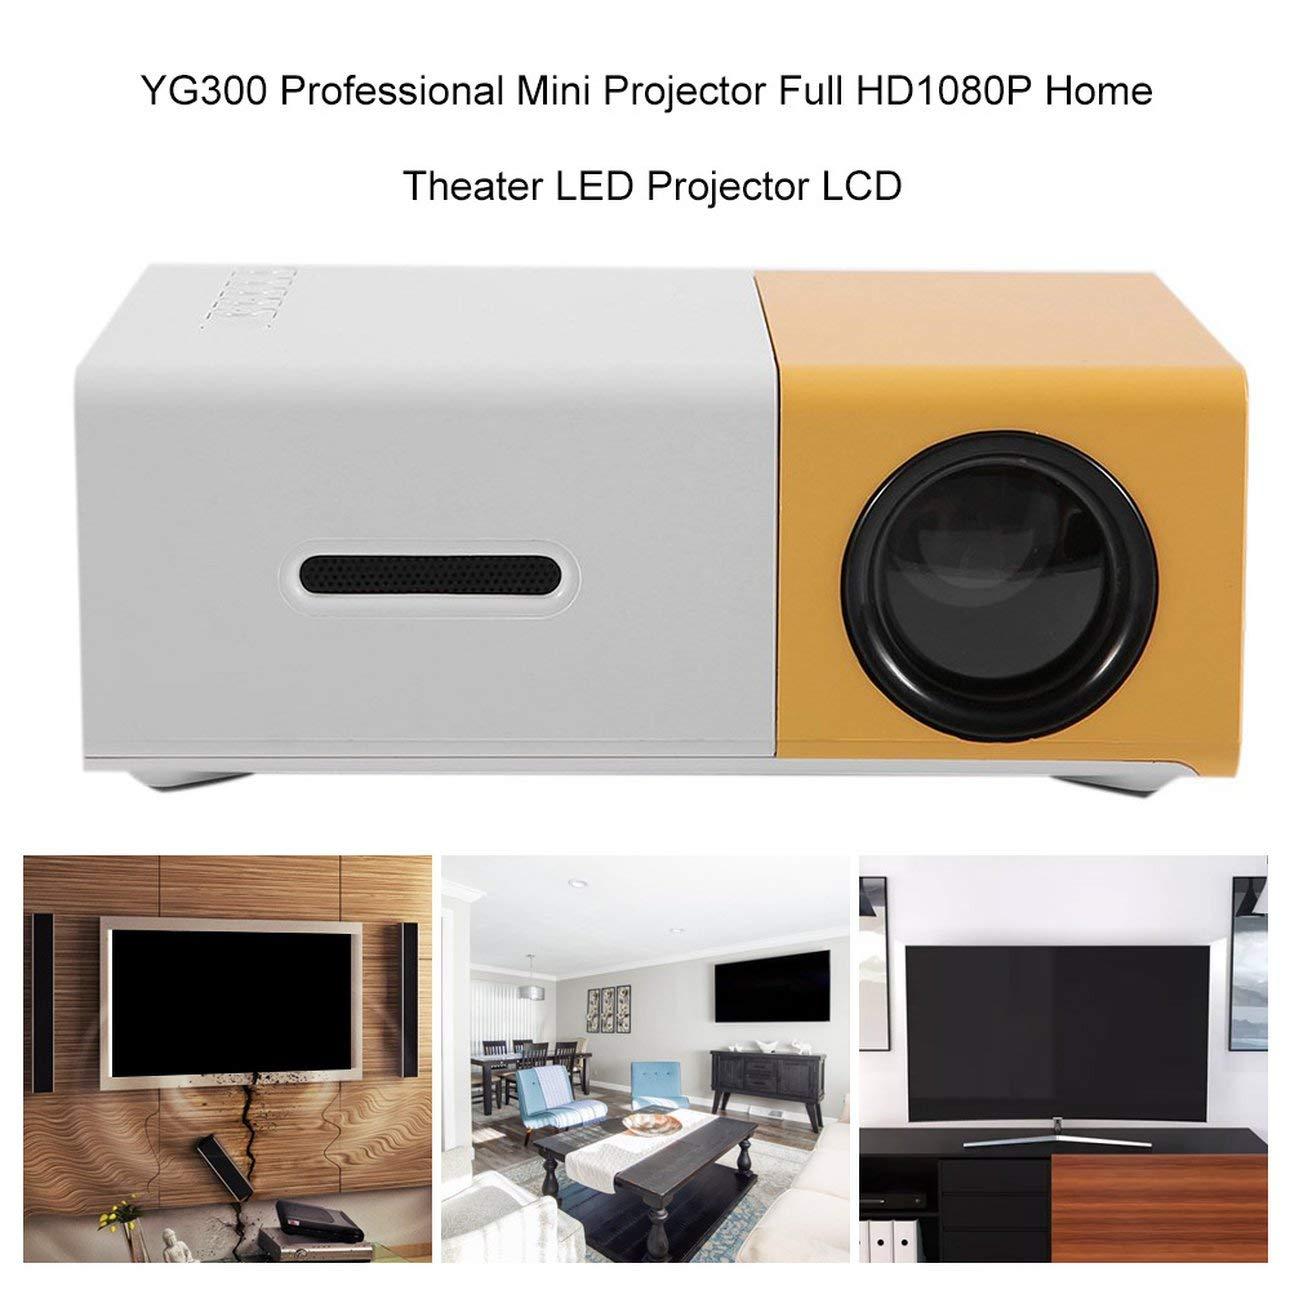 Ballylelly Mini proyector profesional YG300 Full HD1080P Proyector ...